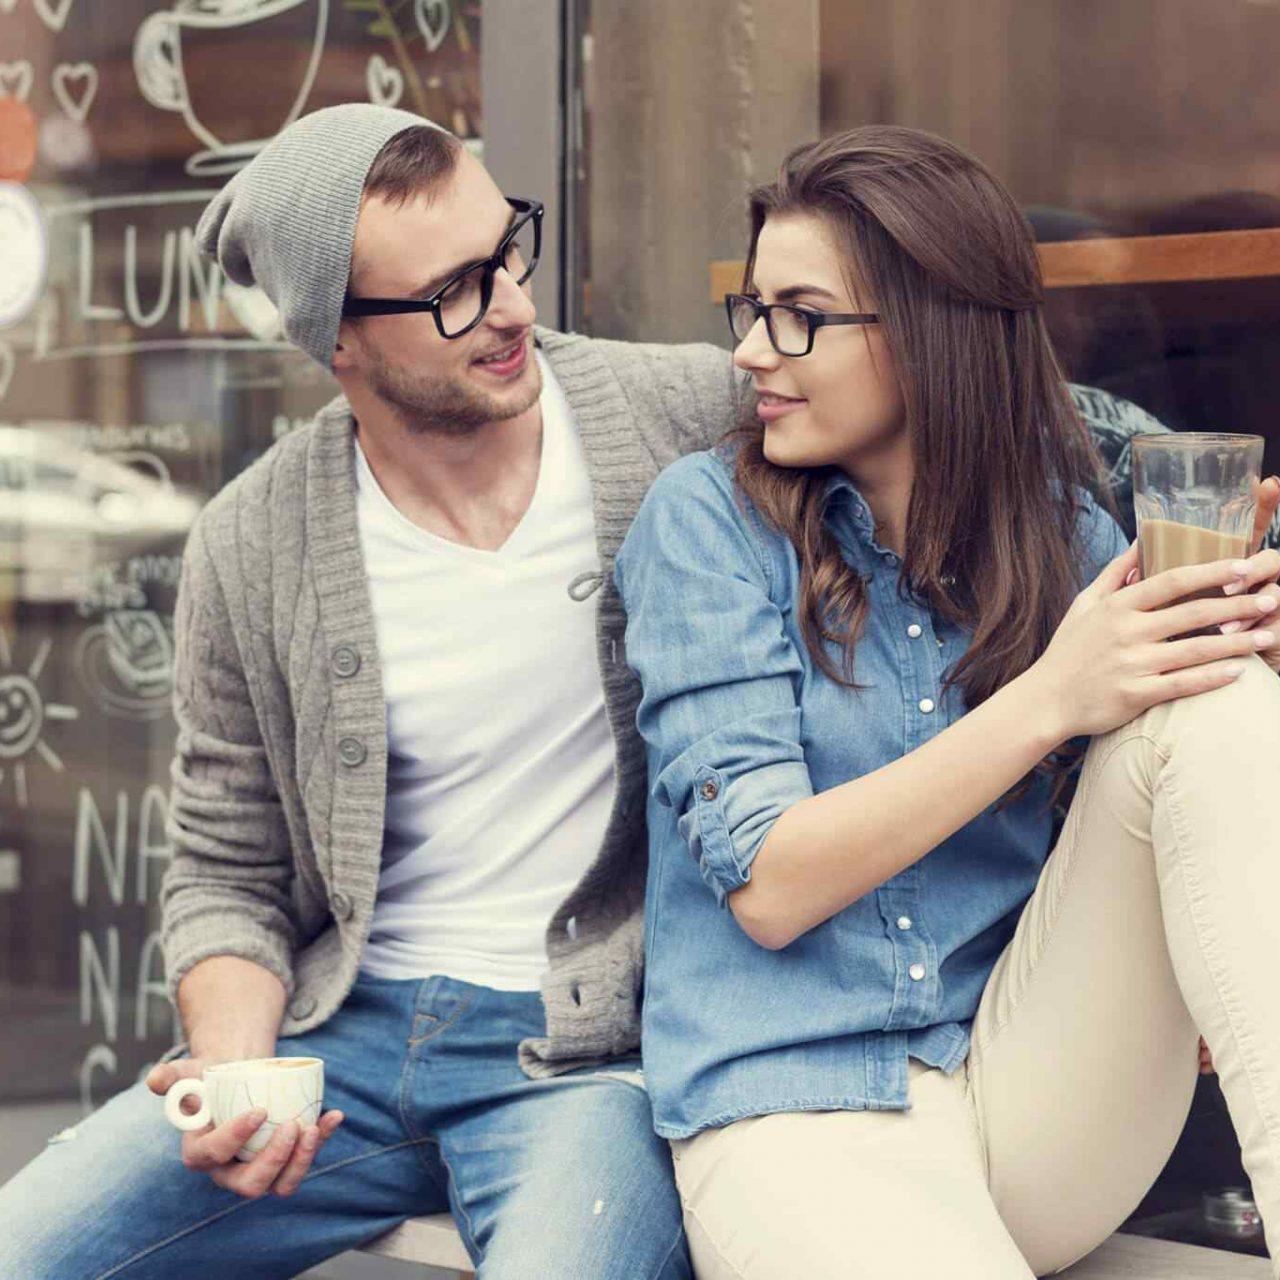 https://www.eryckdzotsi.com/wp-content/uploads/2018/01/img-class-marriage-02-1280x1280.jpg